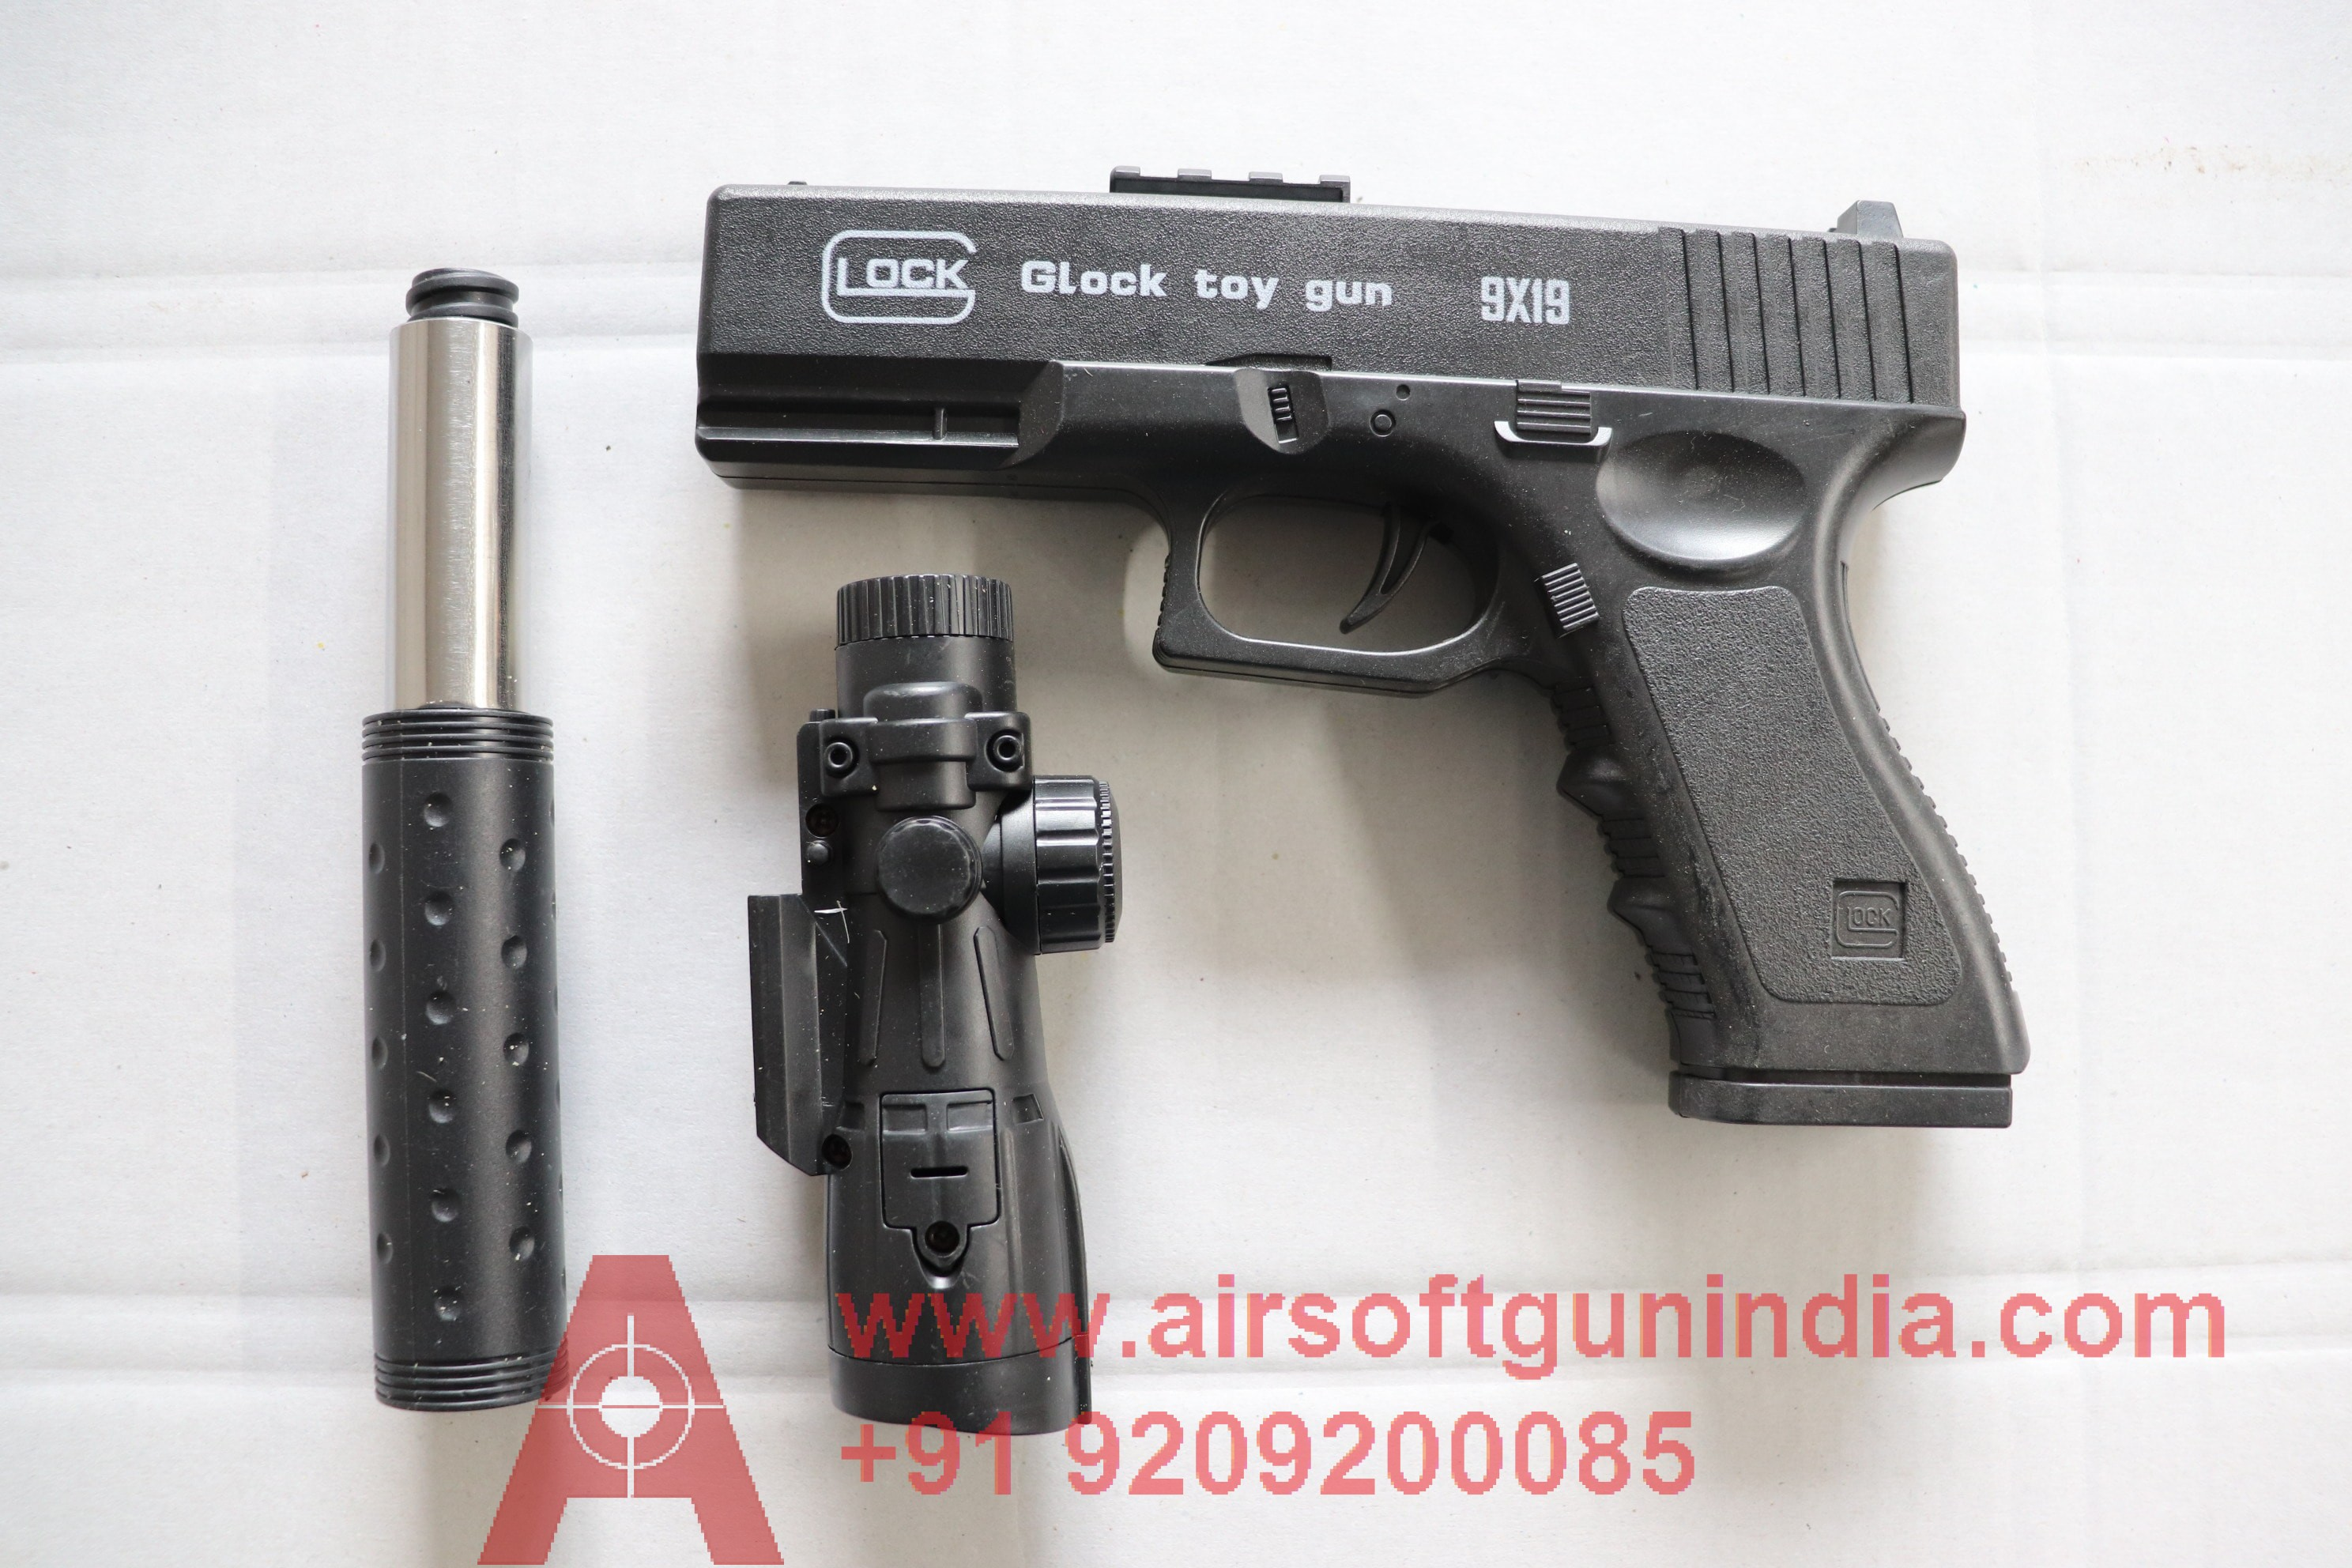 GLOCK 17 BLACK AIRSOFT SPRING PISTOL BY AIRSOFT GUN INDIA